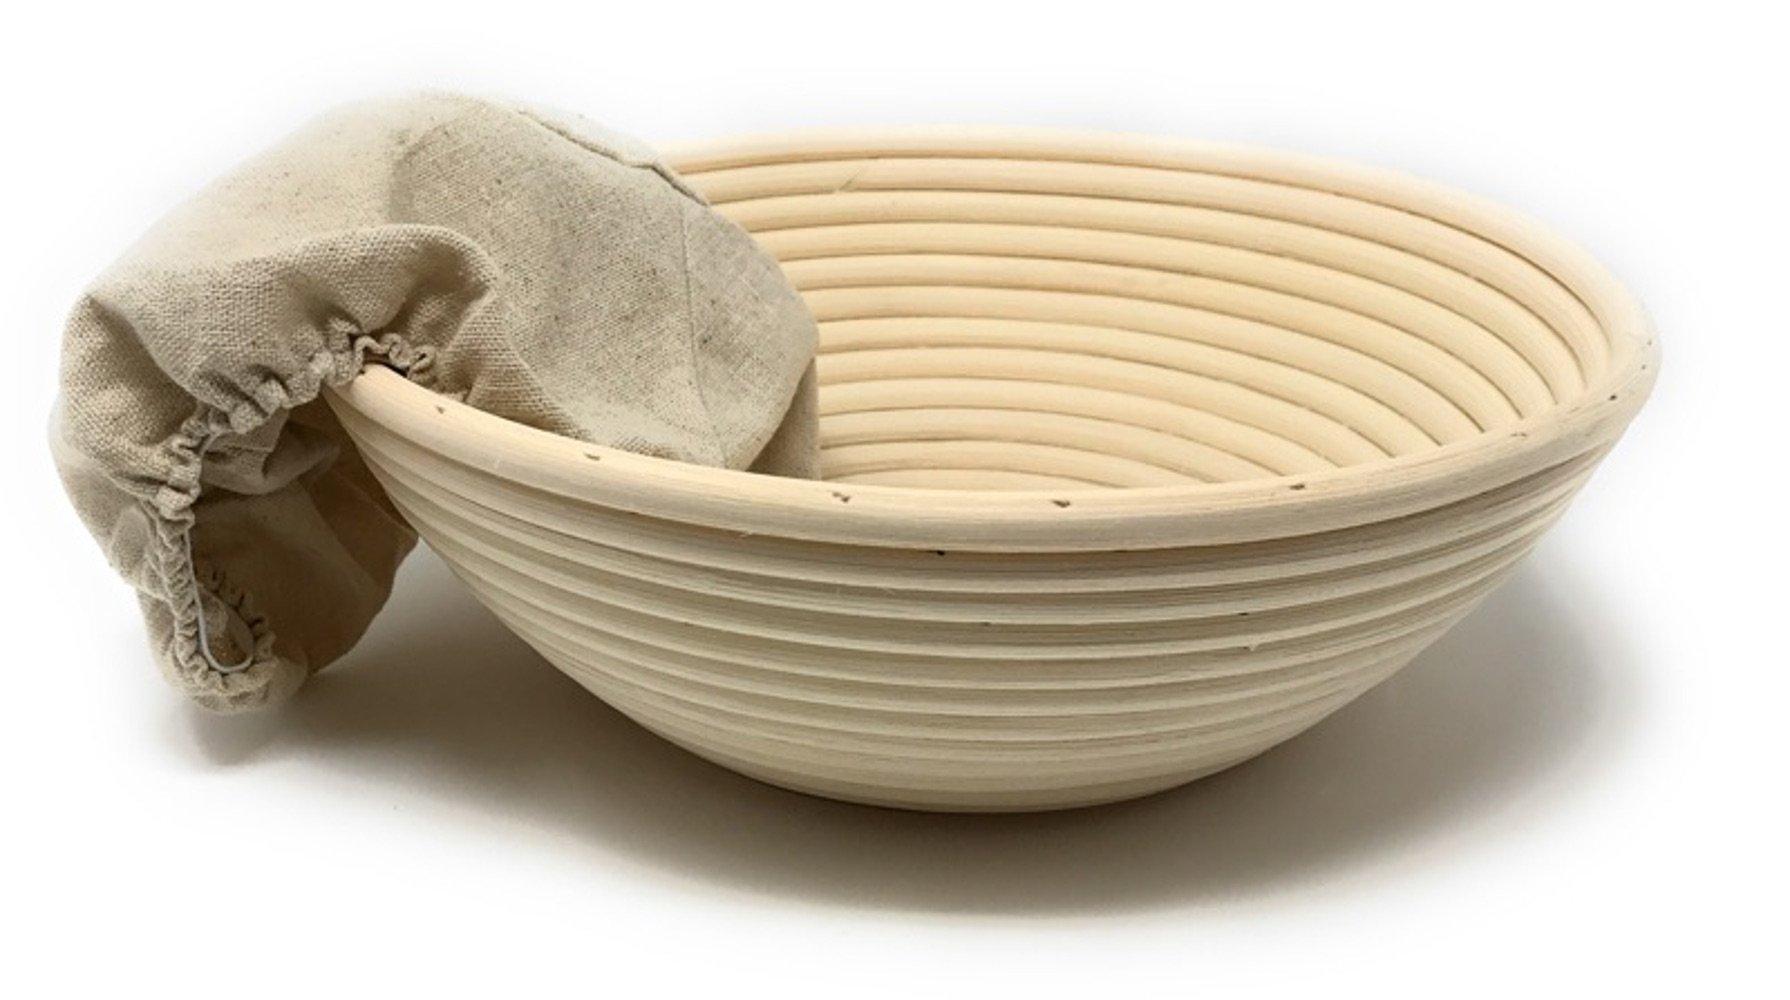 3-Piece Set: Emile Henry Ceramic Round Stewpot Dutch Oven Bread Pot, Burgundy, 8 inch Round Banneton Bread Rising Basket, Fitted Cotton Liner - Bundle by Bundle (Image #3)